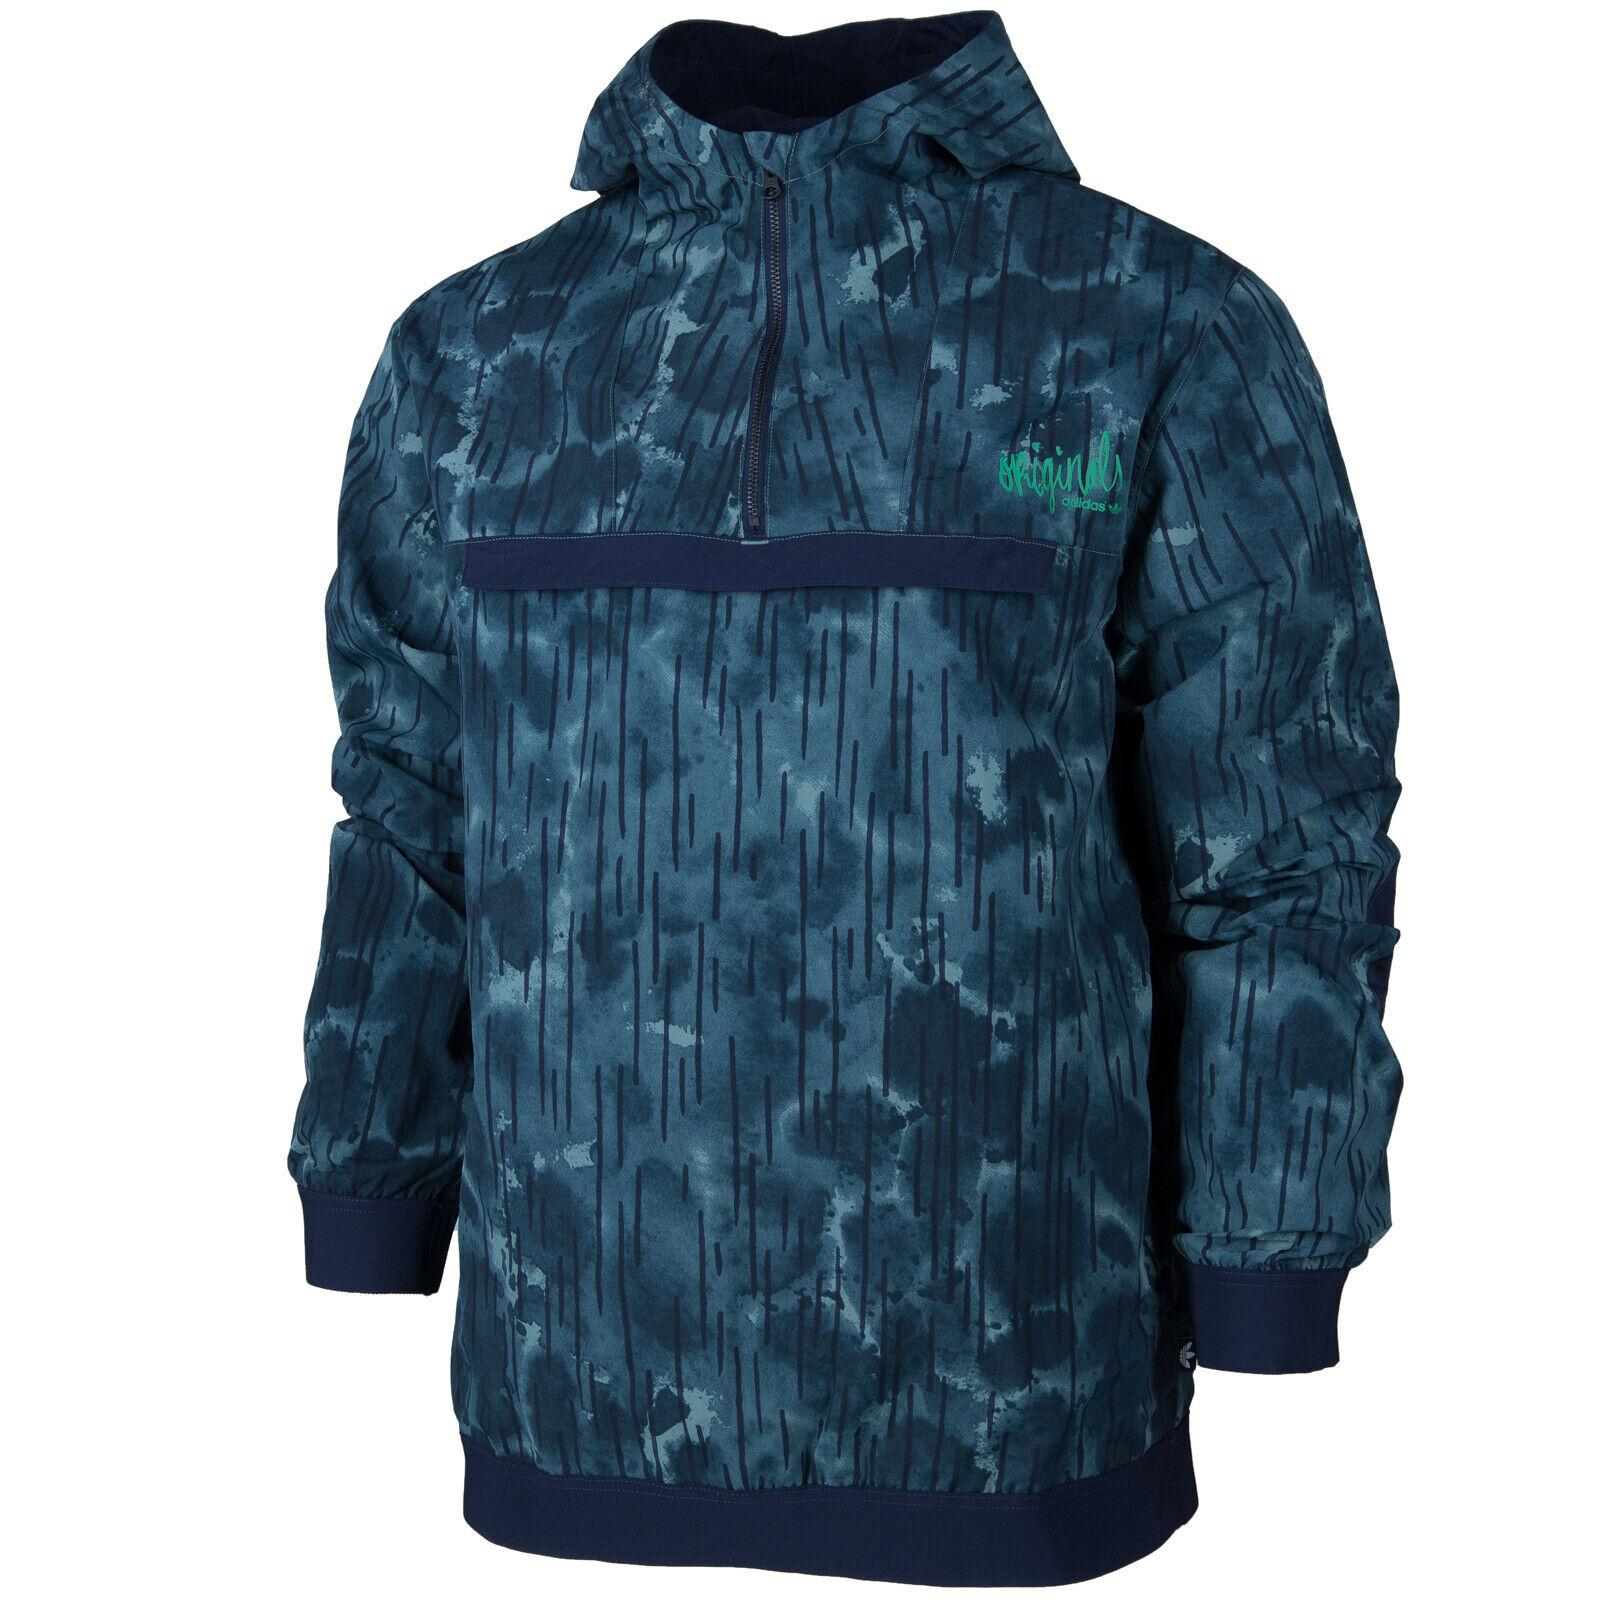 Adidas Originals Street Windbreaker Hooded Men's Jacket Trefoil Rainproof F77872